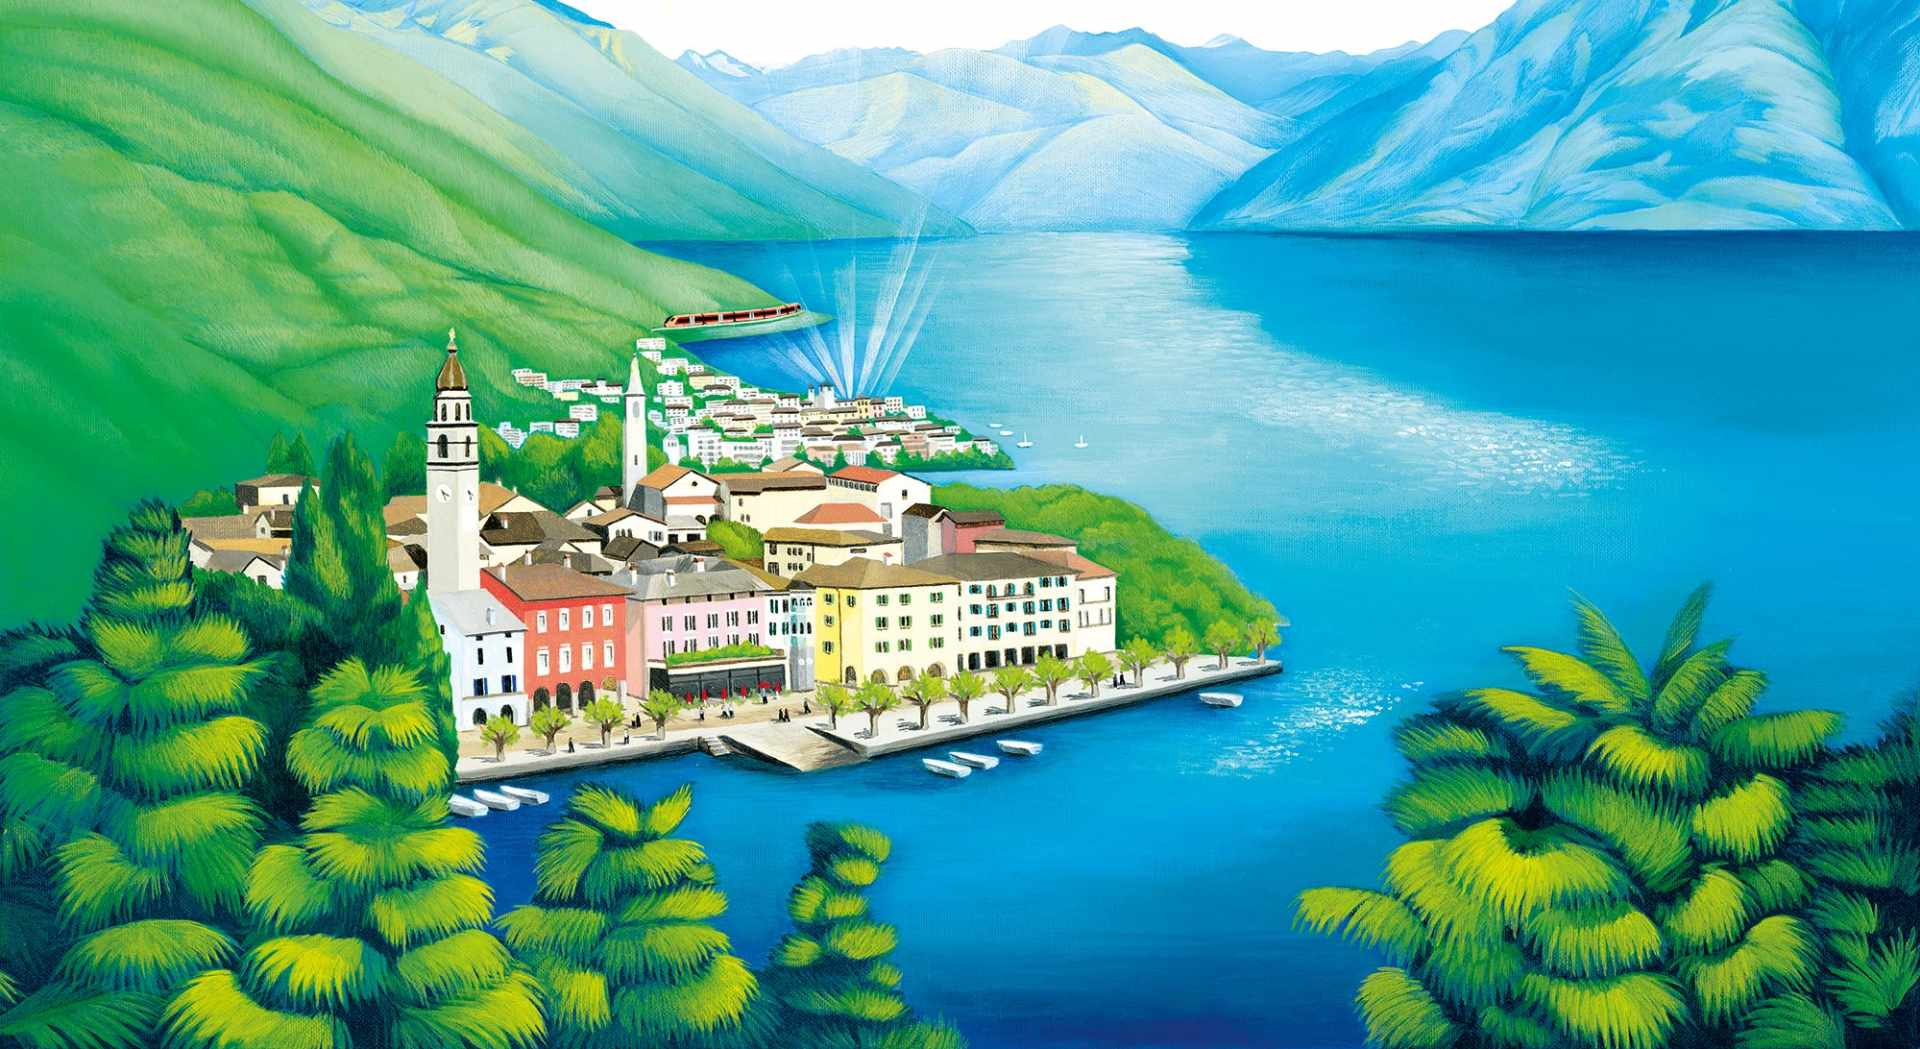 Ascona gemalt von Iluna Tinta